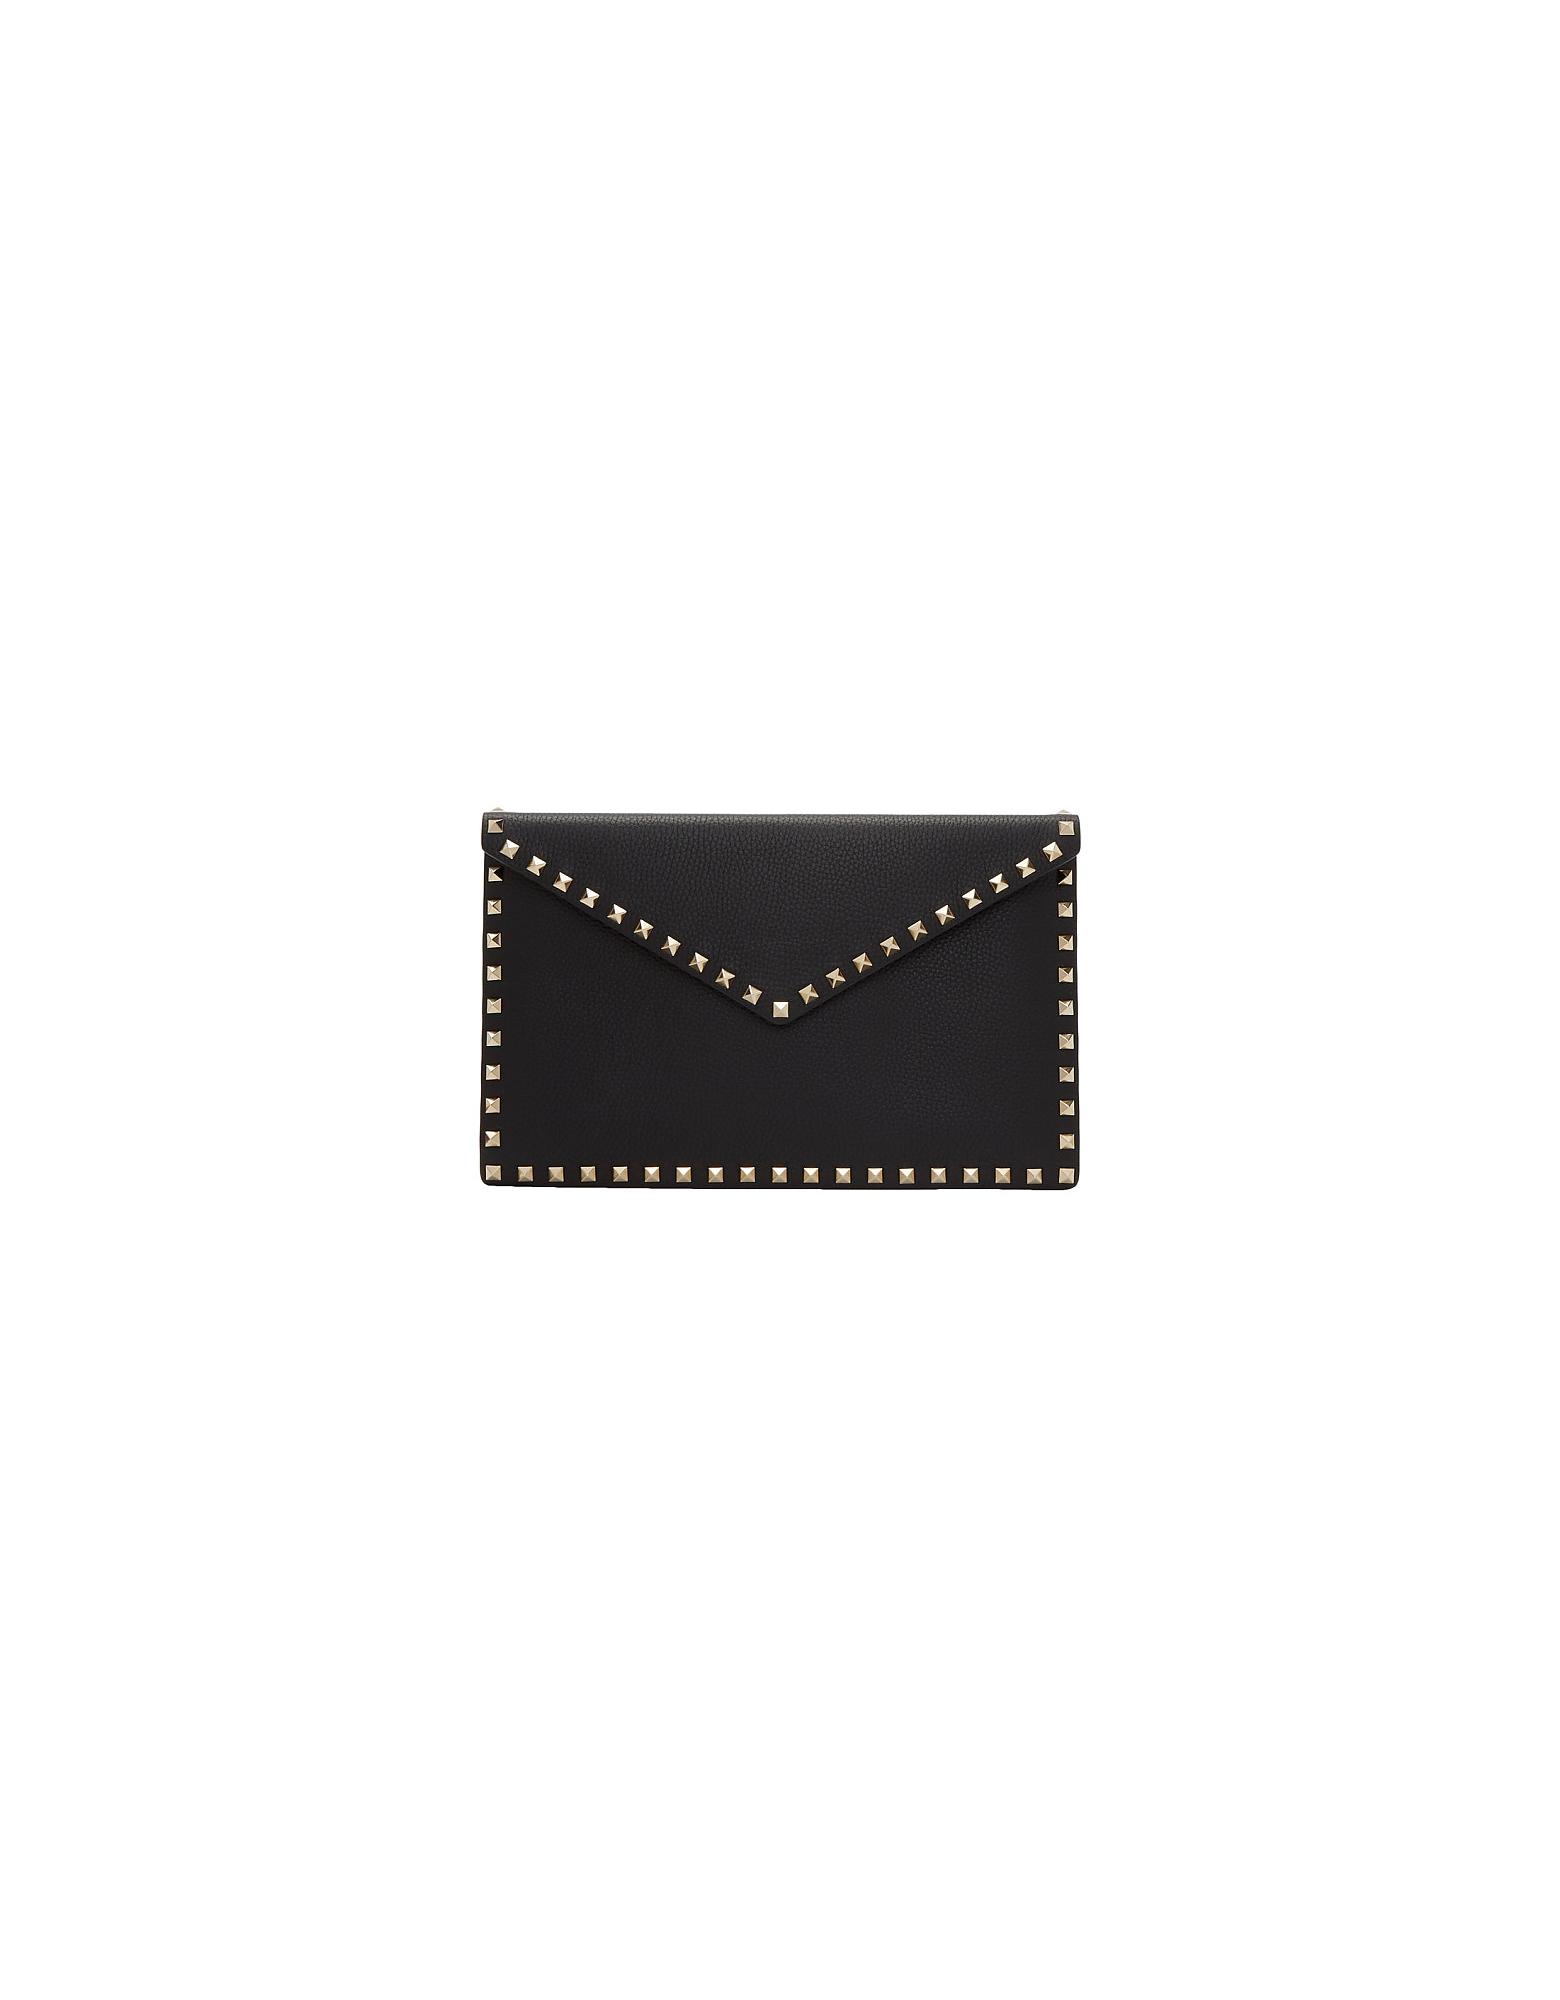 Valentino Designer Handbags, Black Valentino Garavani Large Rockstud Envelope Pouch